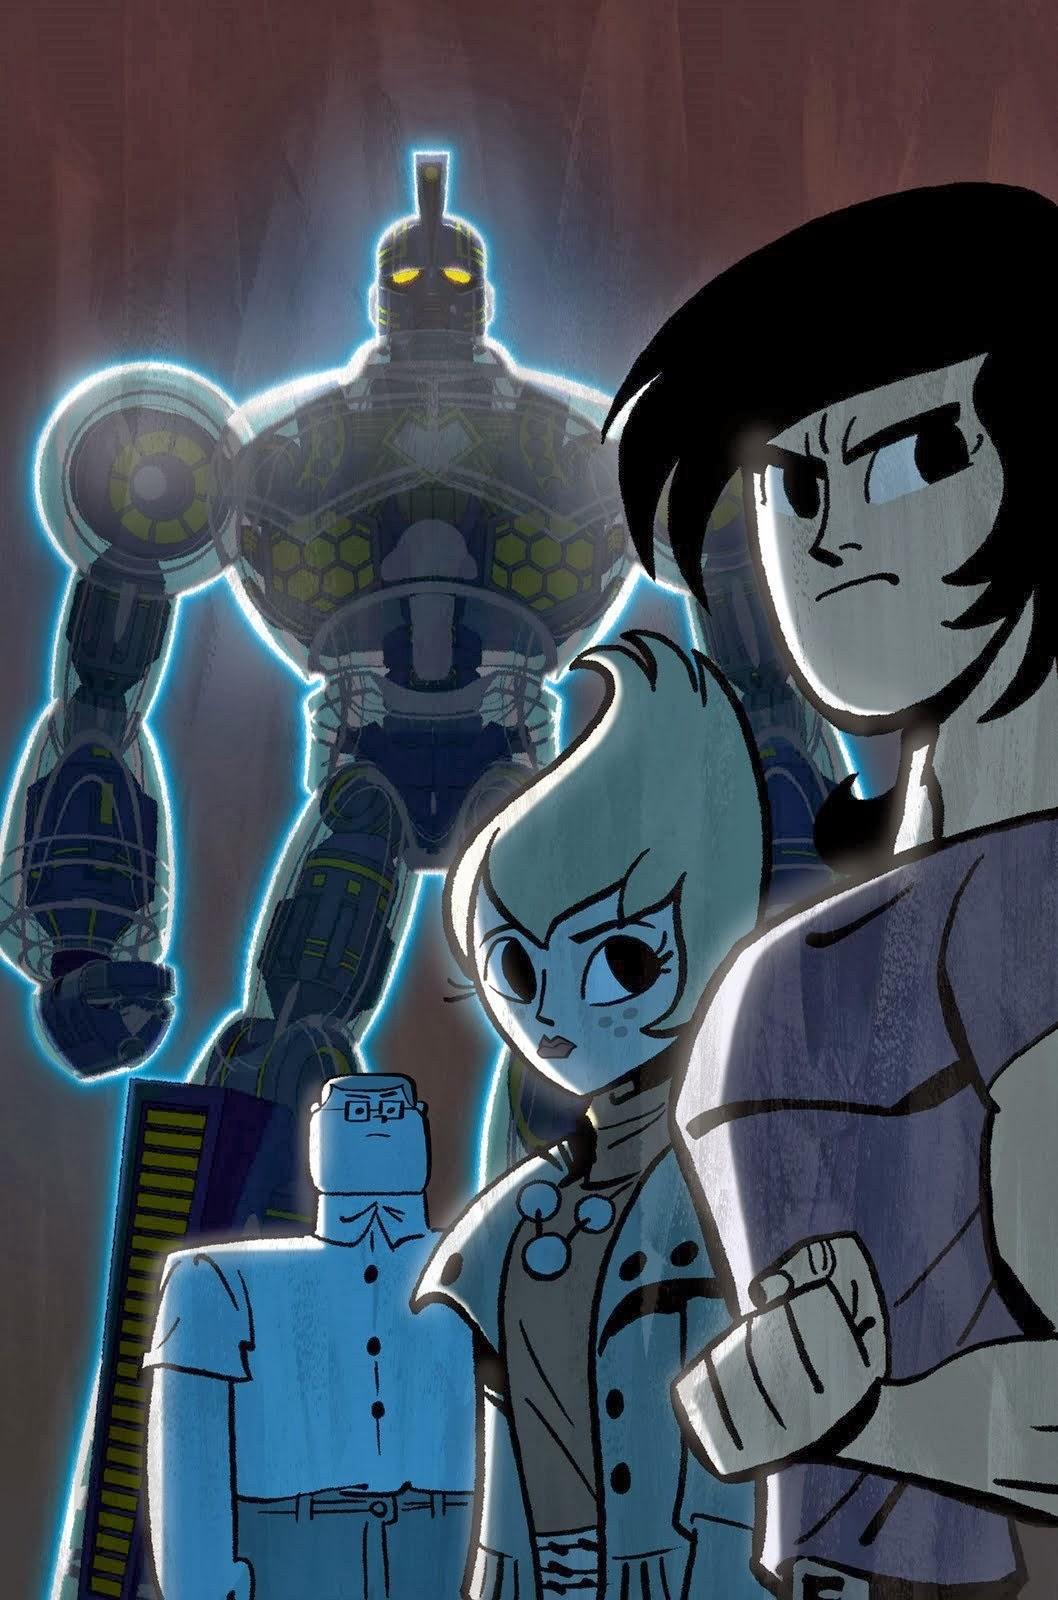 Sym-Bionic-Titan-sym-bionic-titan-16261623-1058-1600